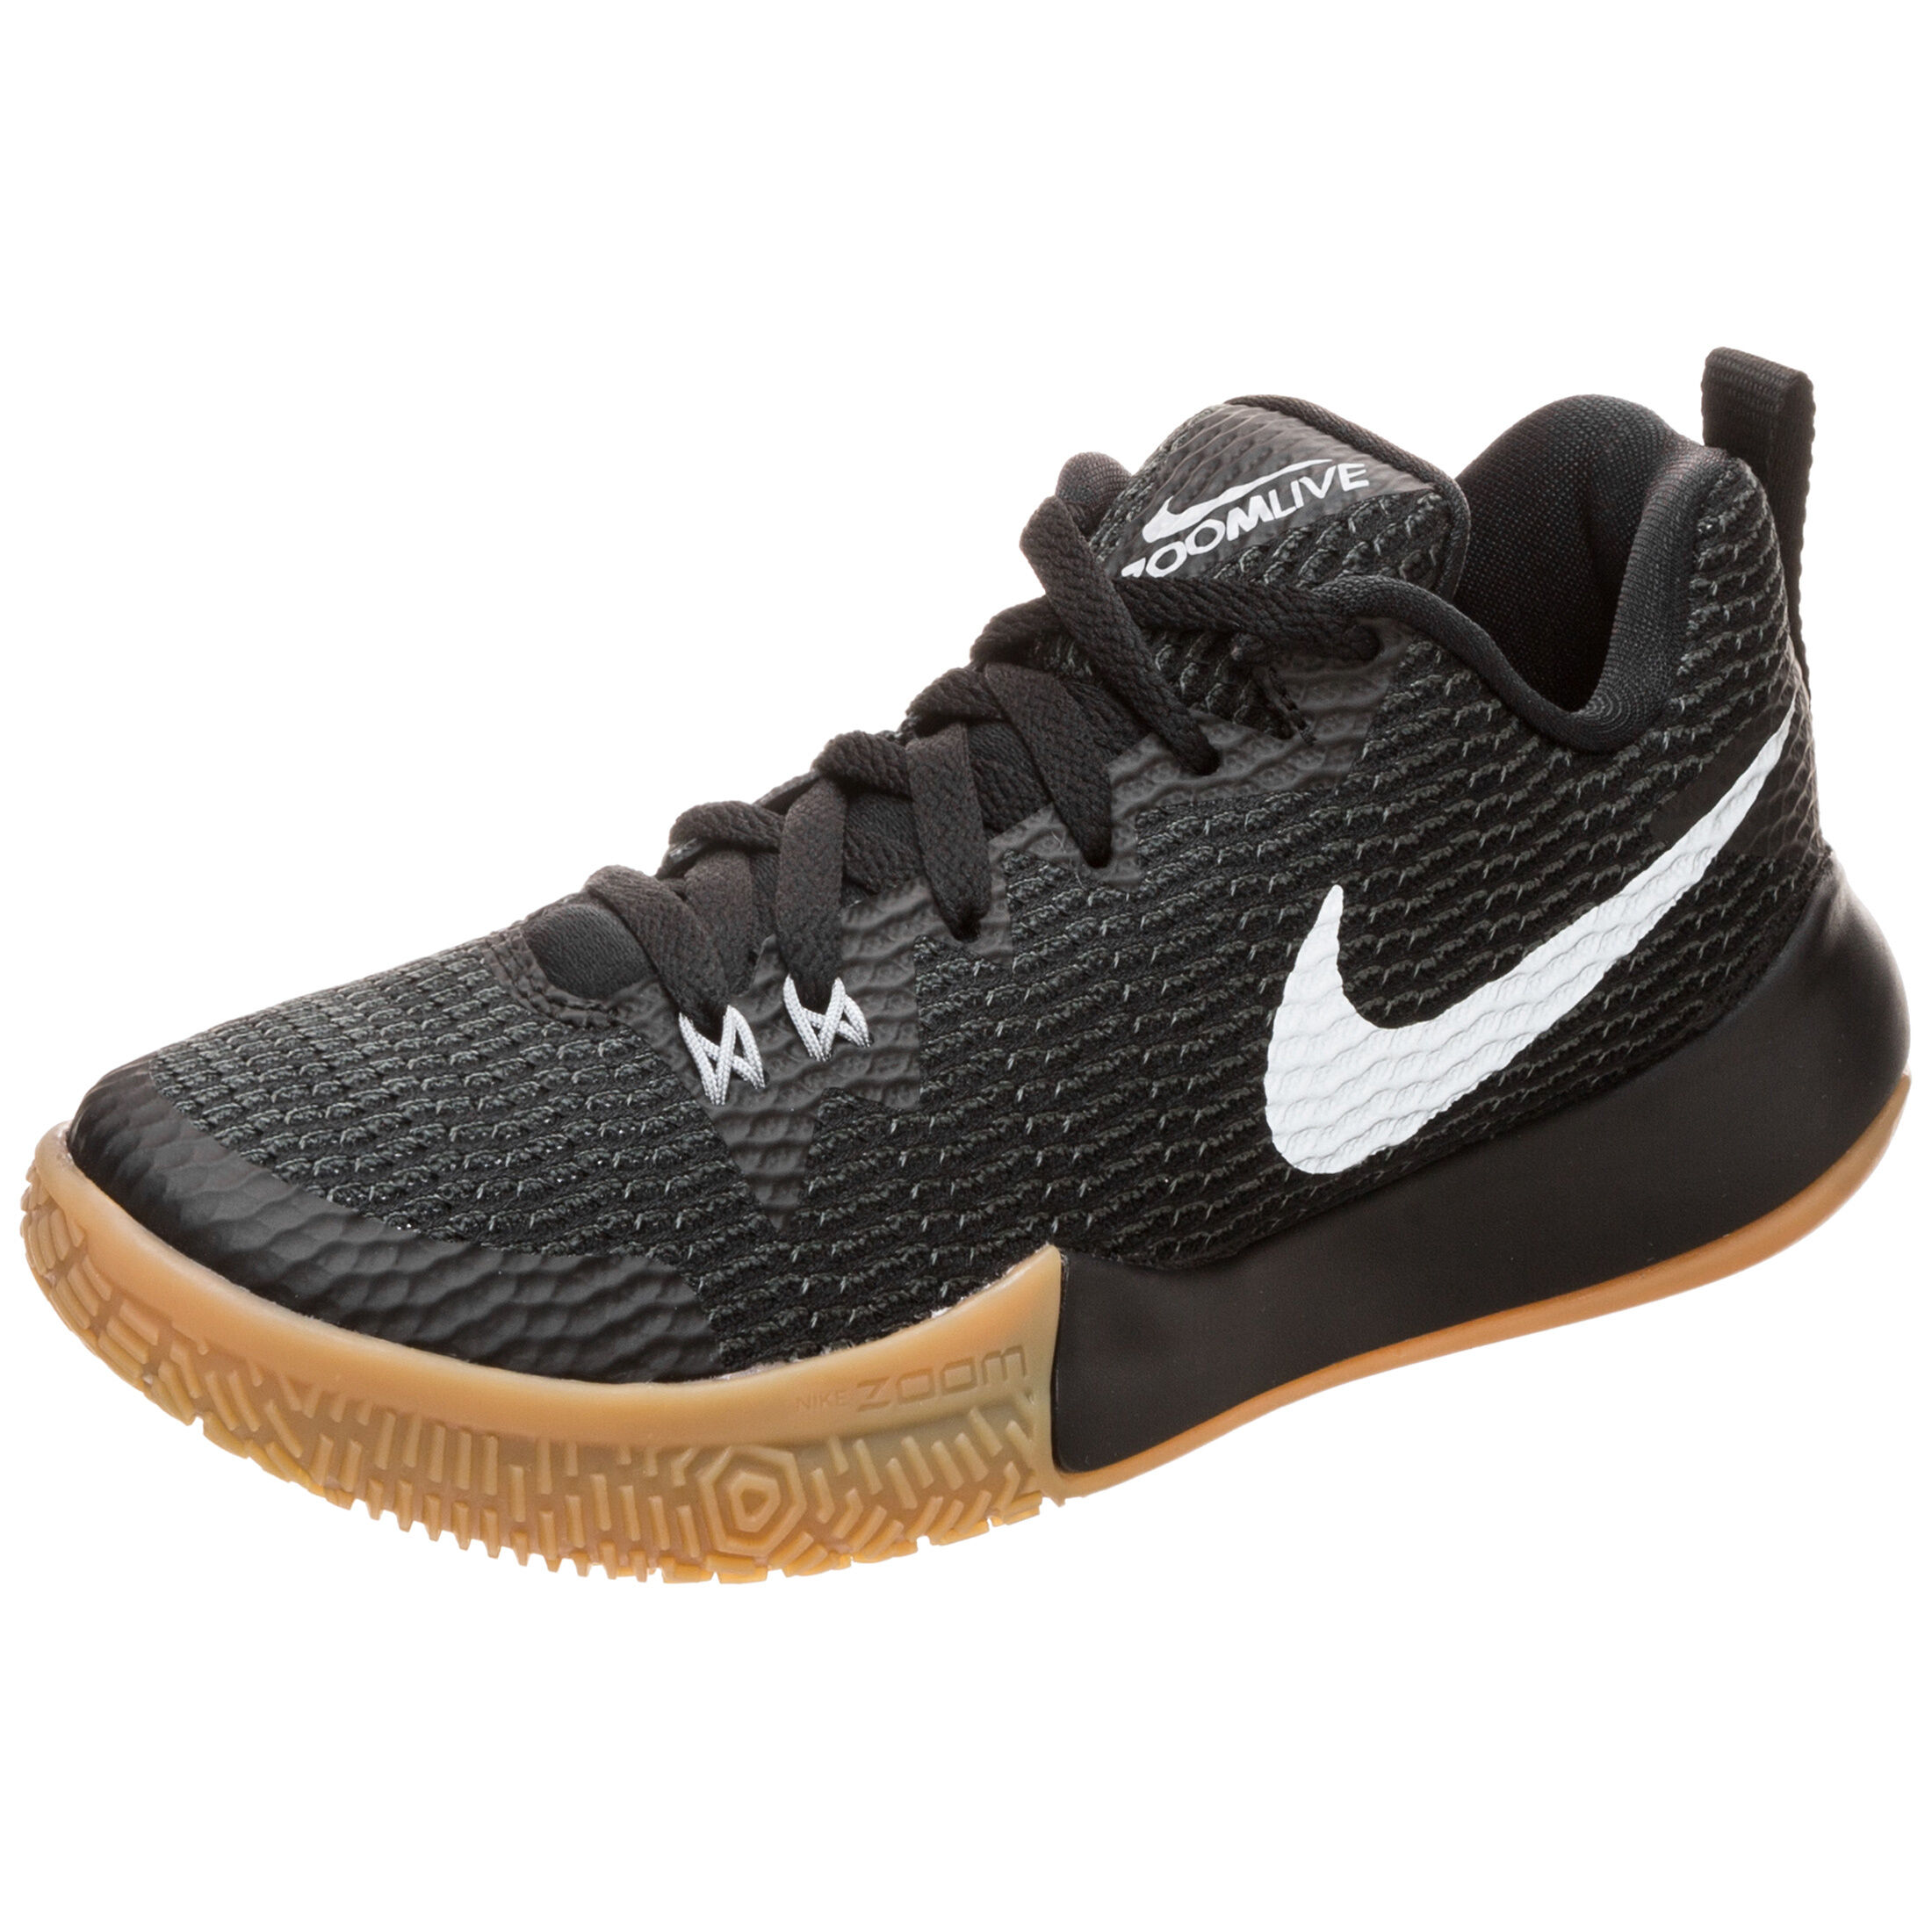 Nike Basketballschuhe | Nike Zoom Live II Damen Schwarz